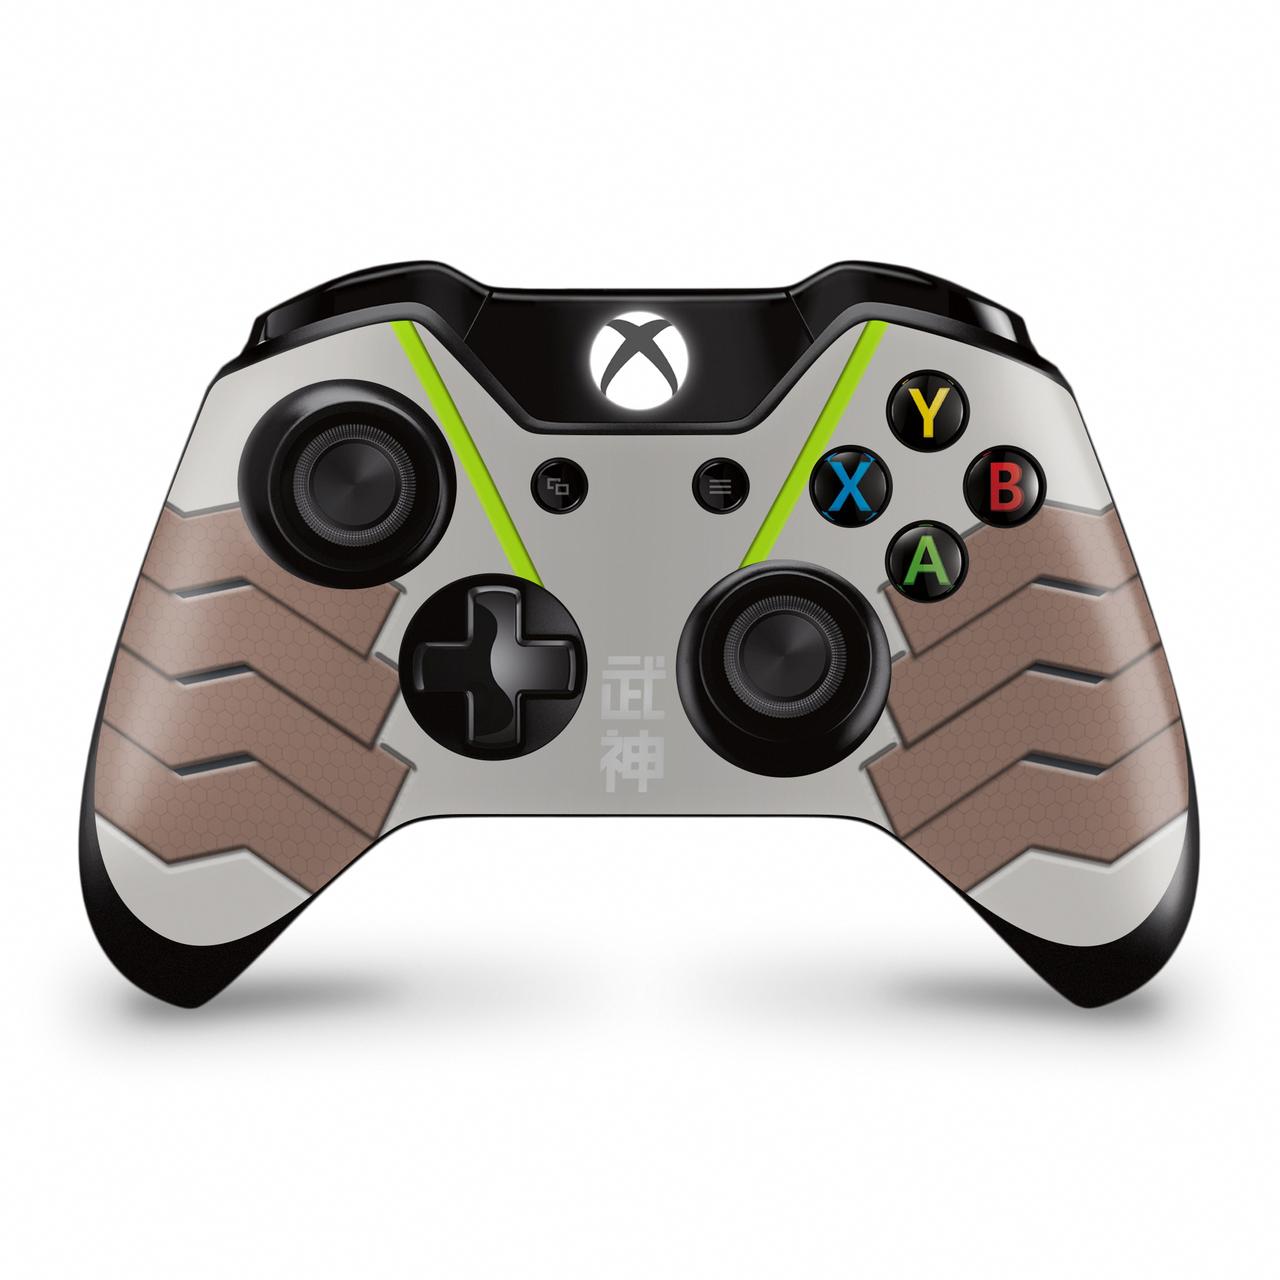 Genji Xbox One Controller Skin Www Eeshops Net Consoles De Videogame Xbox Consoles